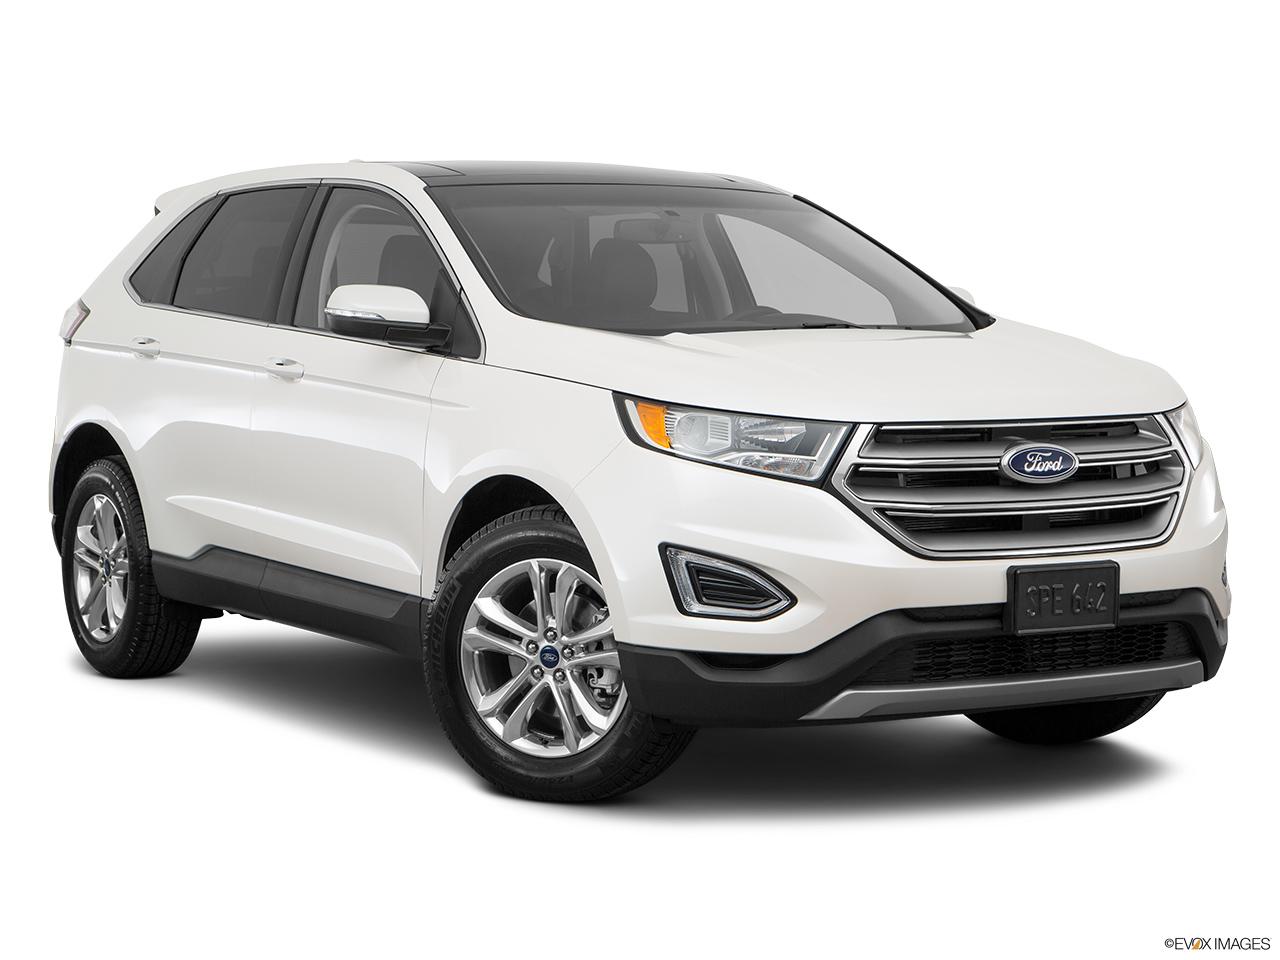 Ford Edge L Ecoboost Sel Awd Kuwait Front Passenger